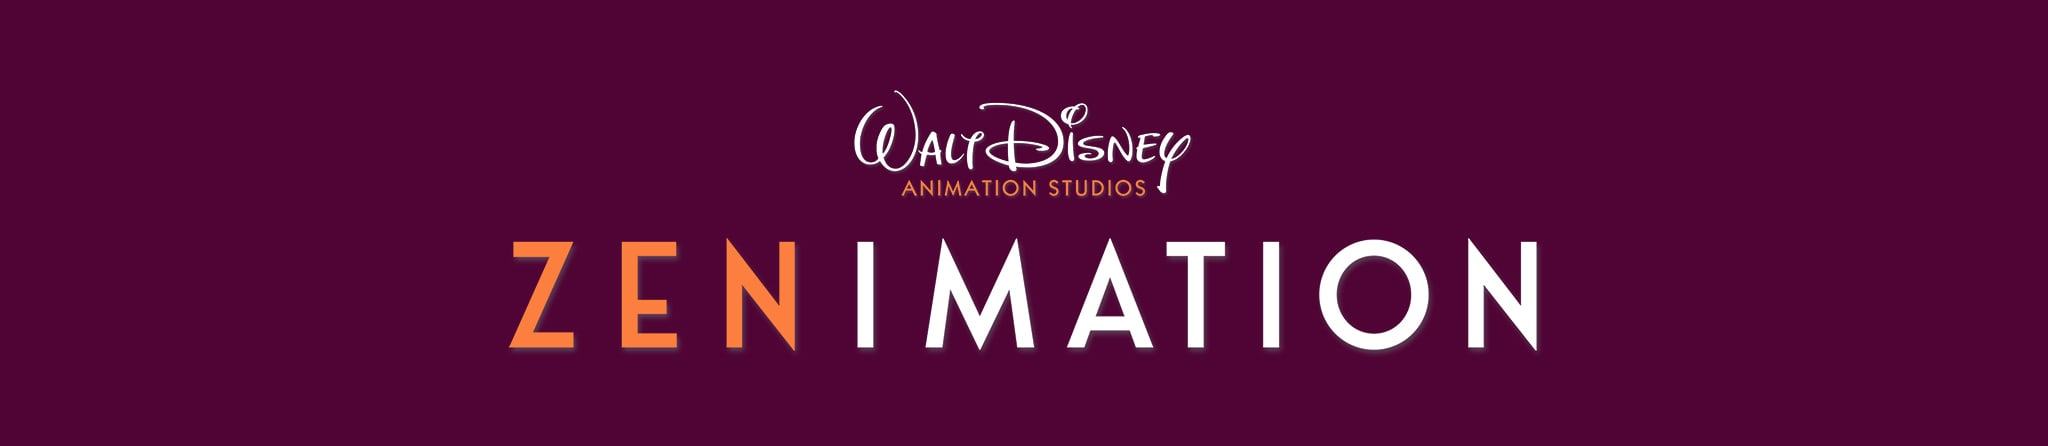 Walt Disney Animation Studios | Zenimation